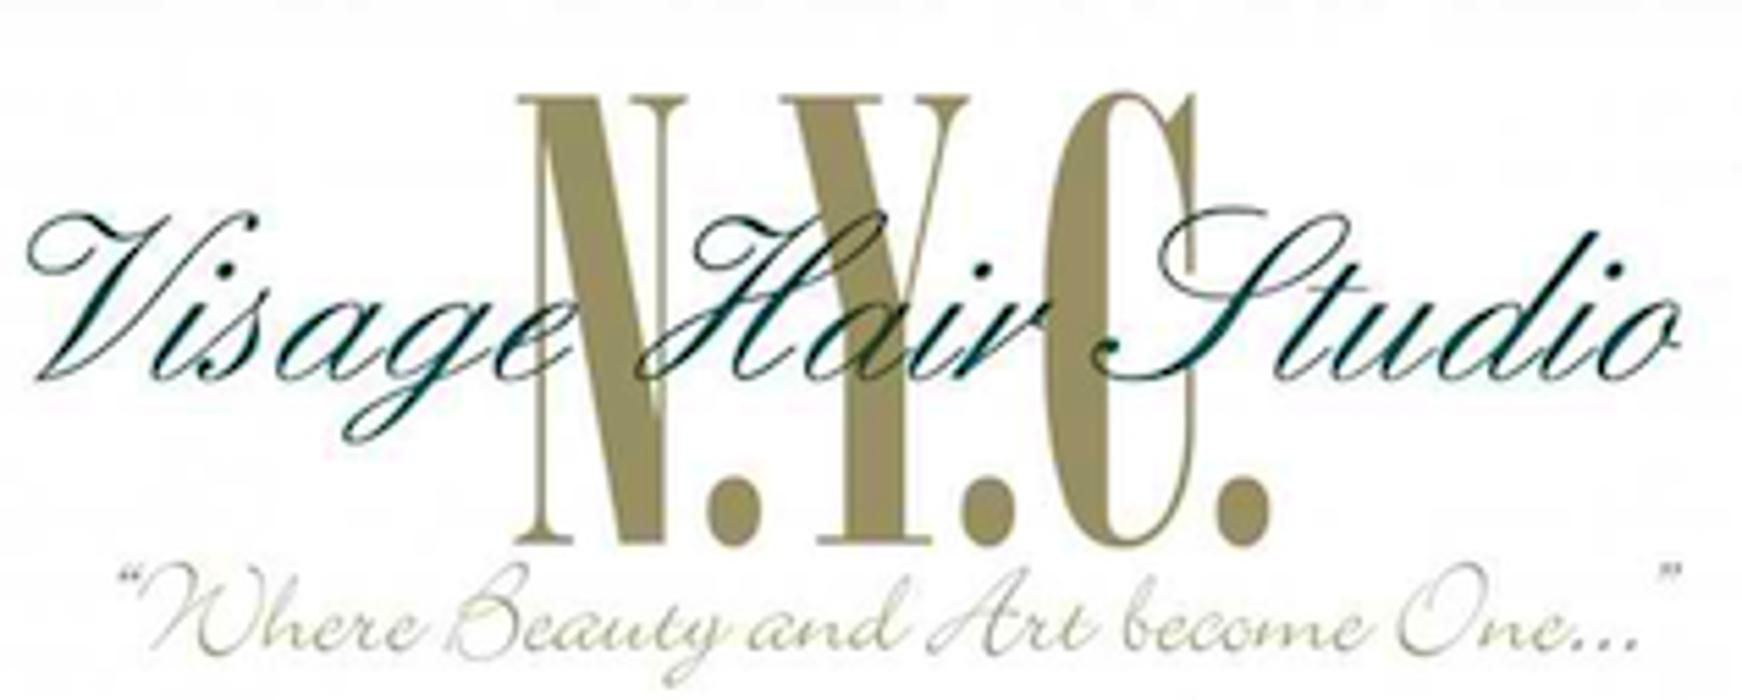 Visage Hair Studio NYC - Staten Island, NY